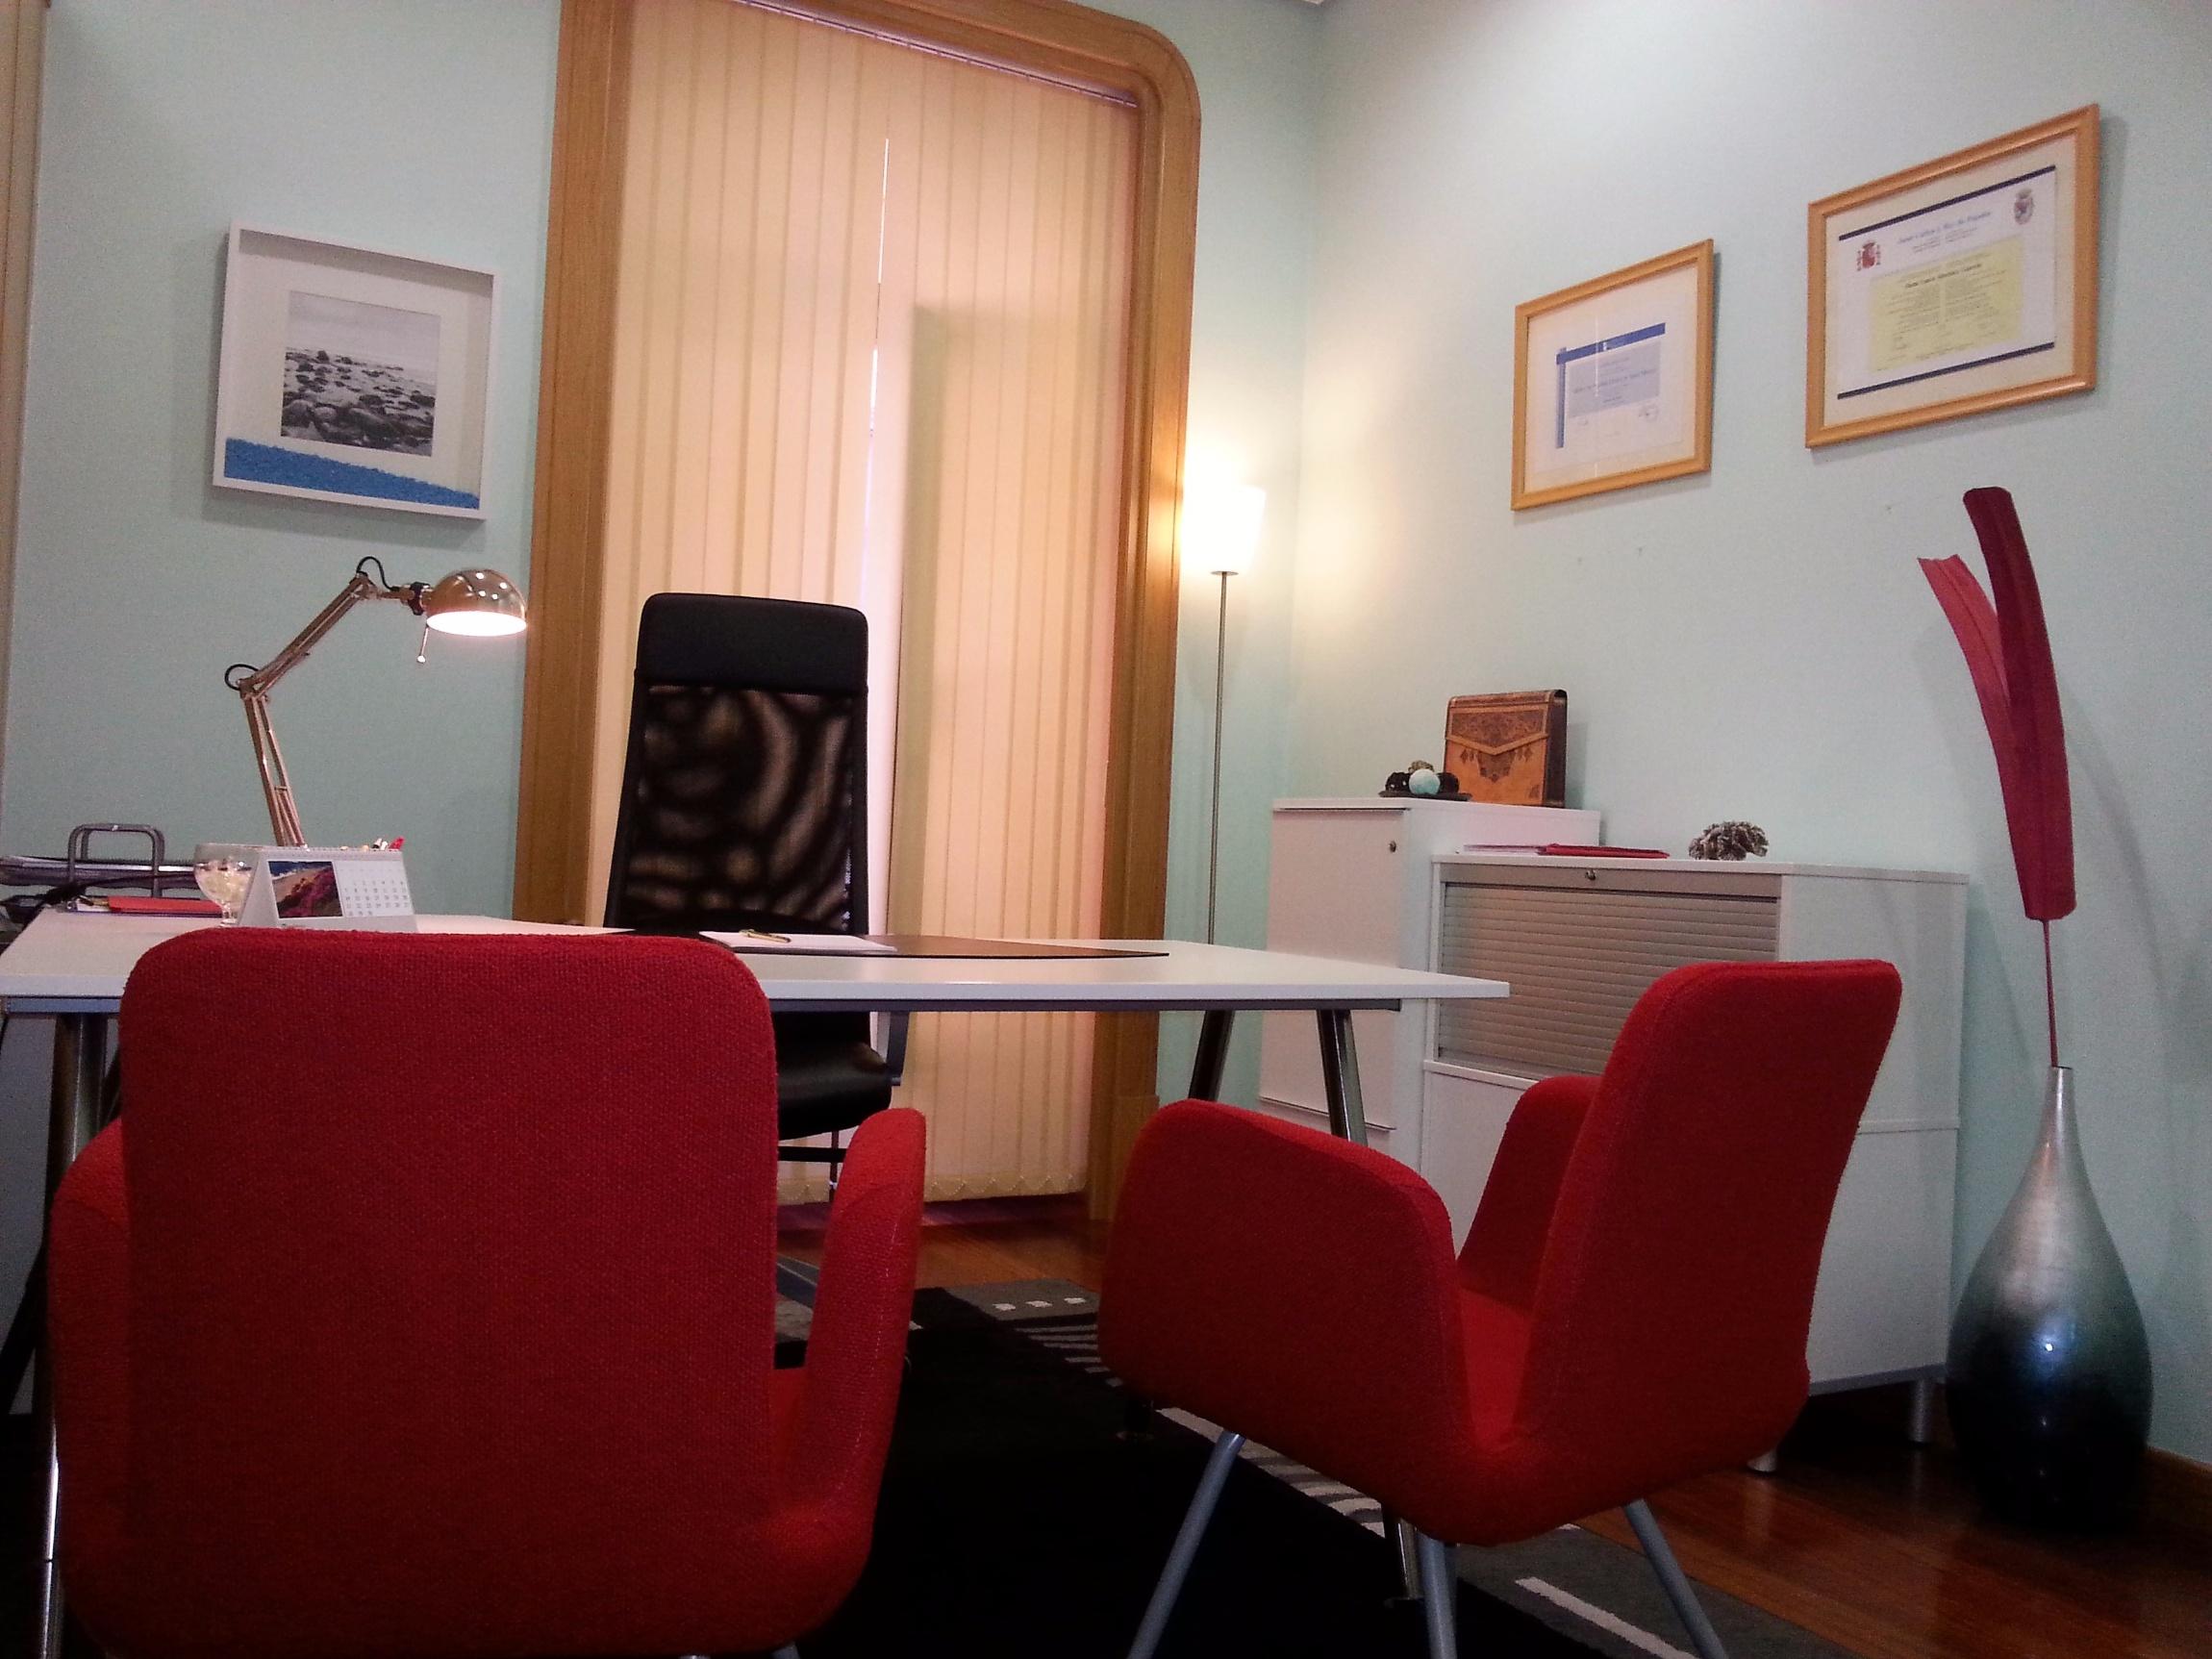 Despacho de Psicologo Vigo